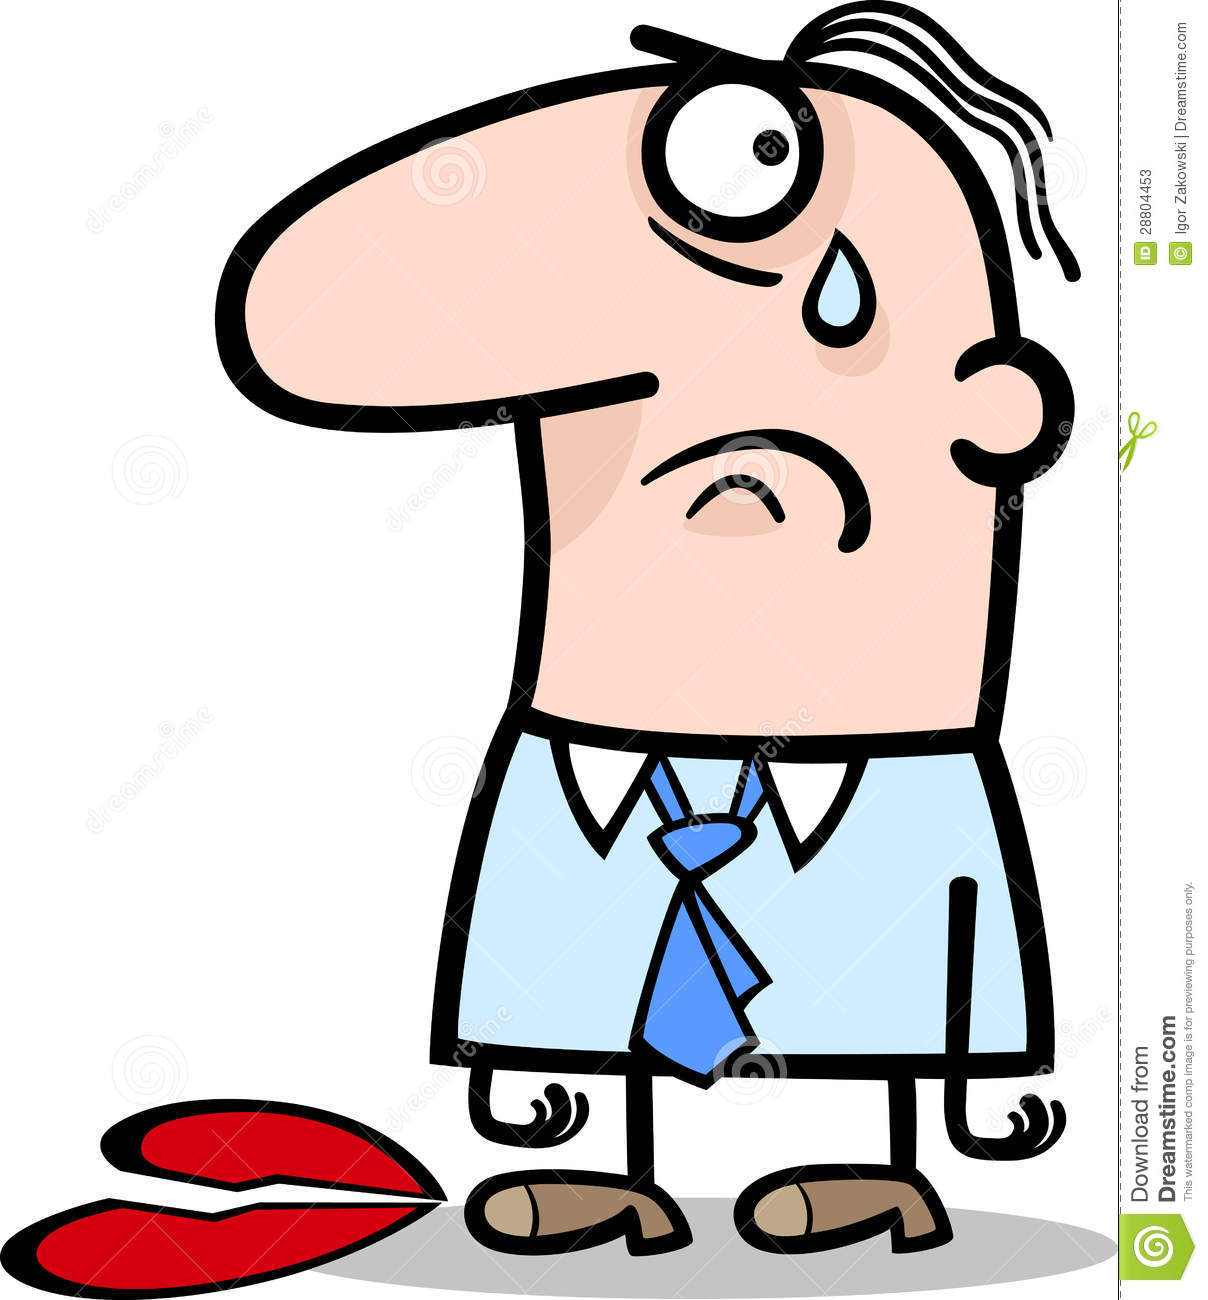 sad cartoon people clipart best